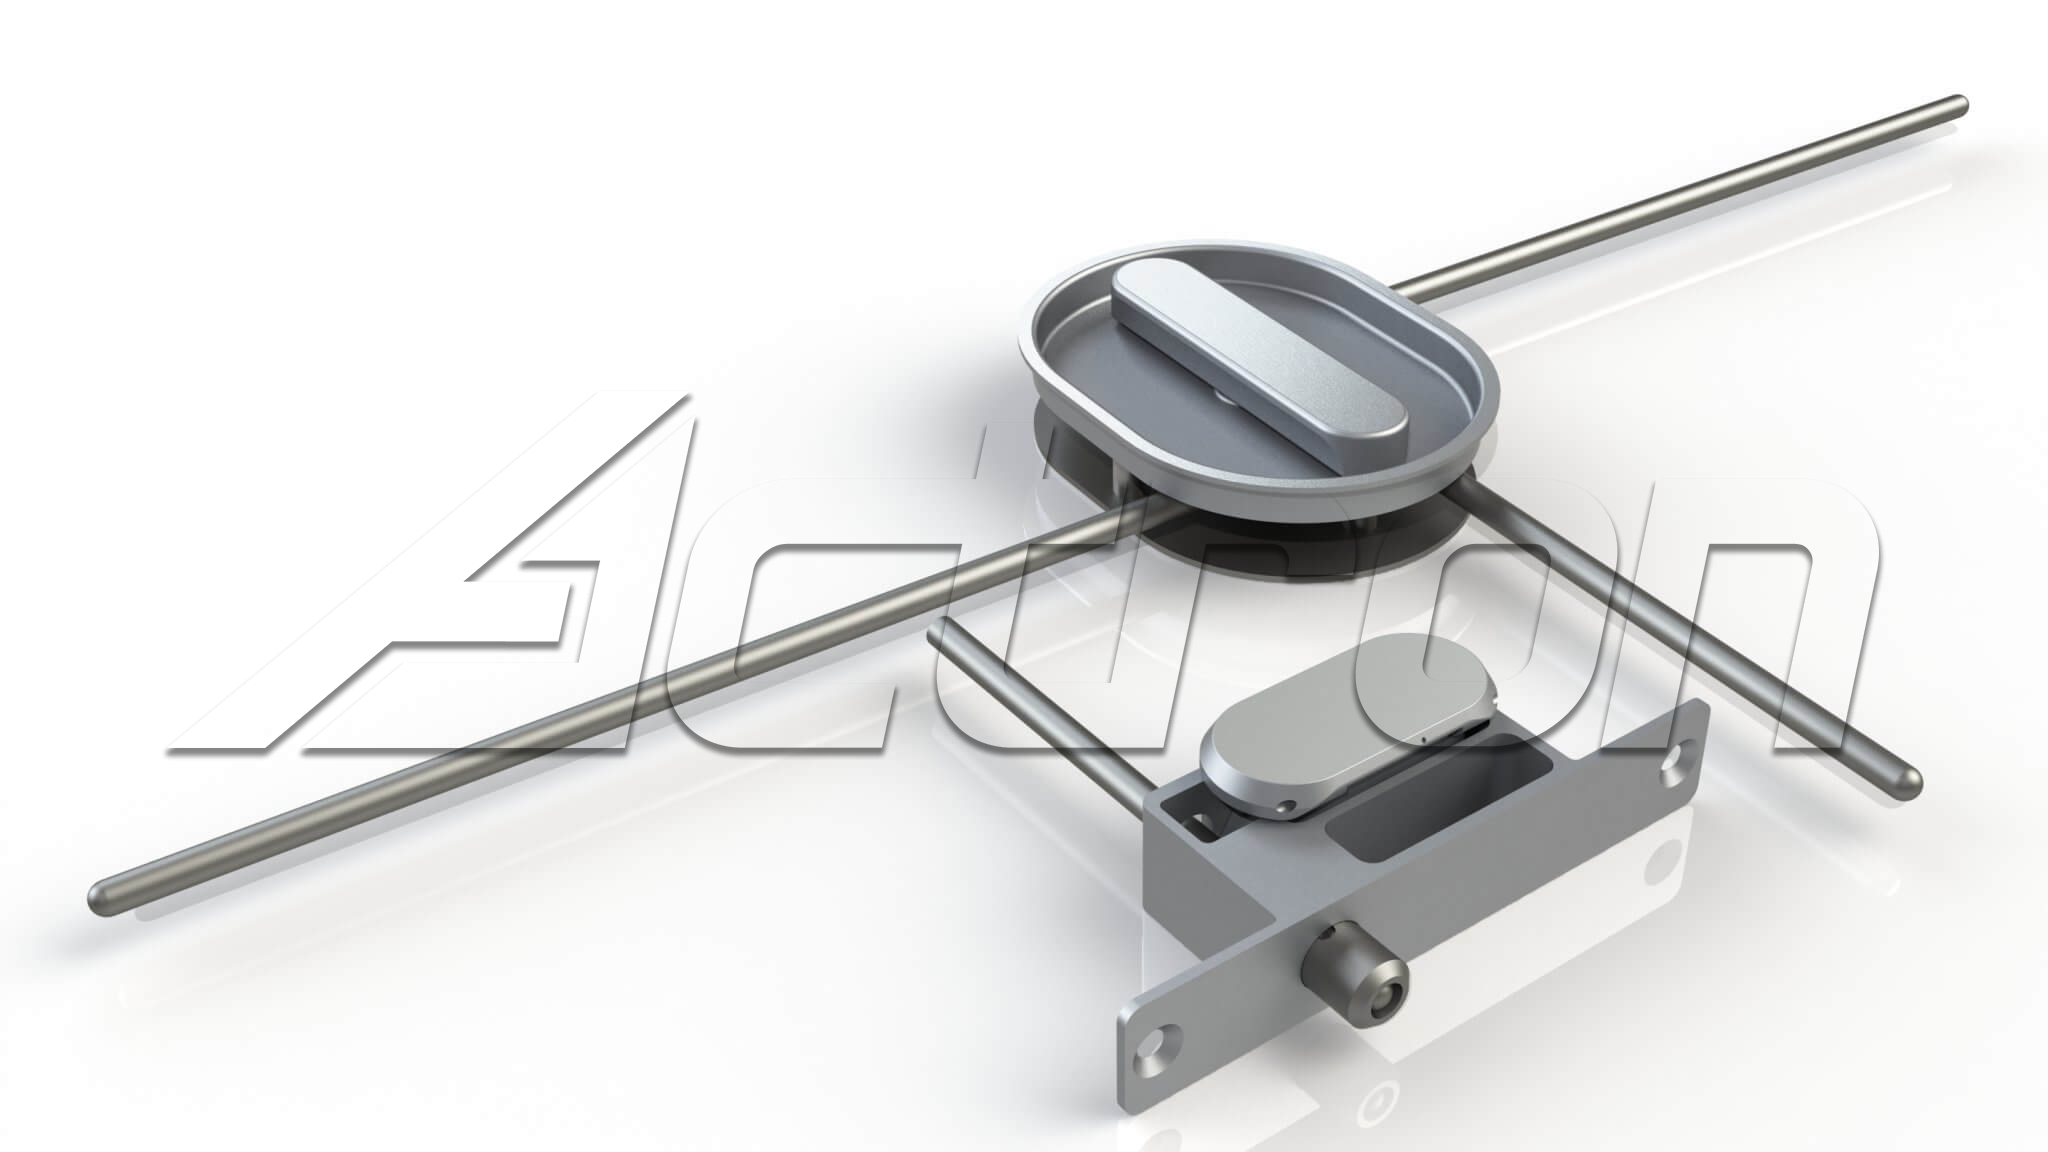 door-bolting-system-8211-lever-5644-a39161.jpg